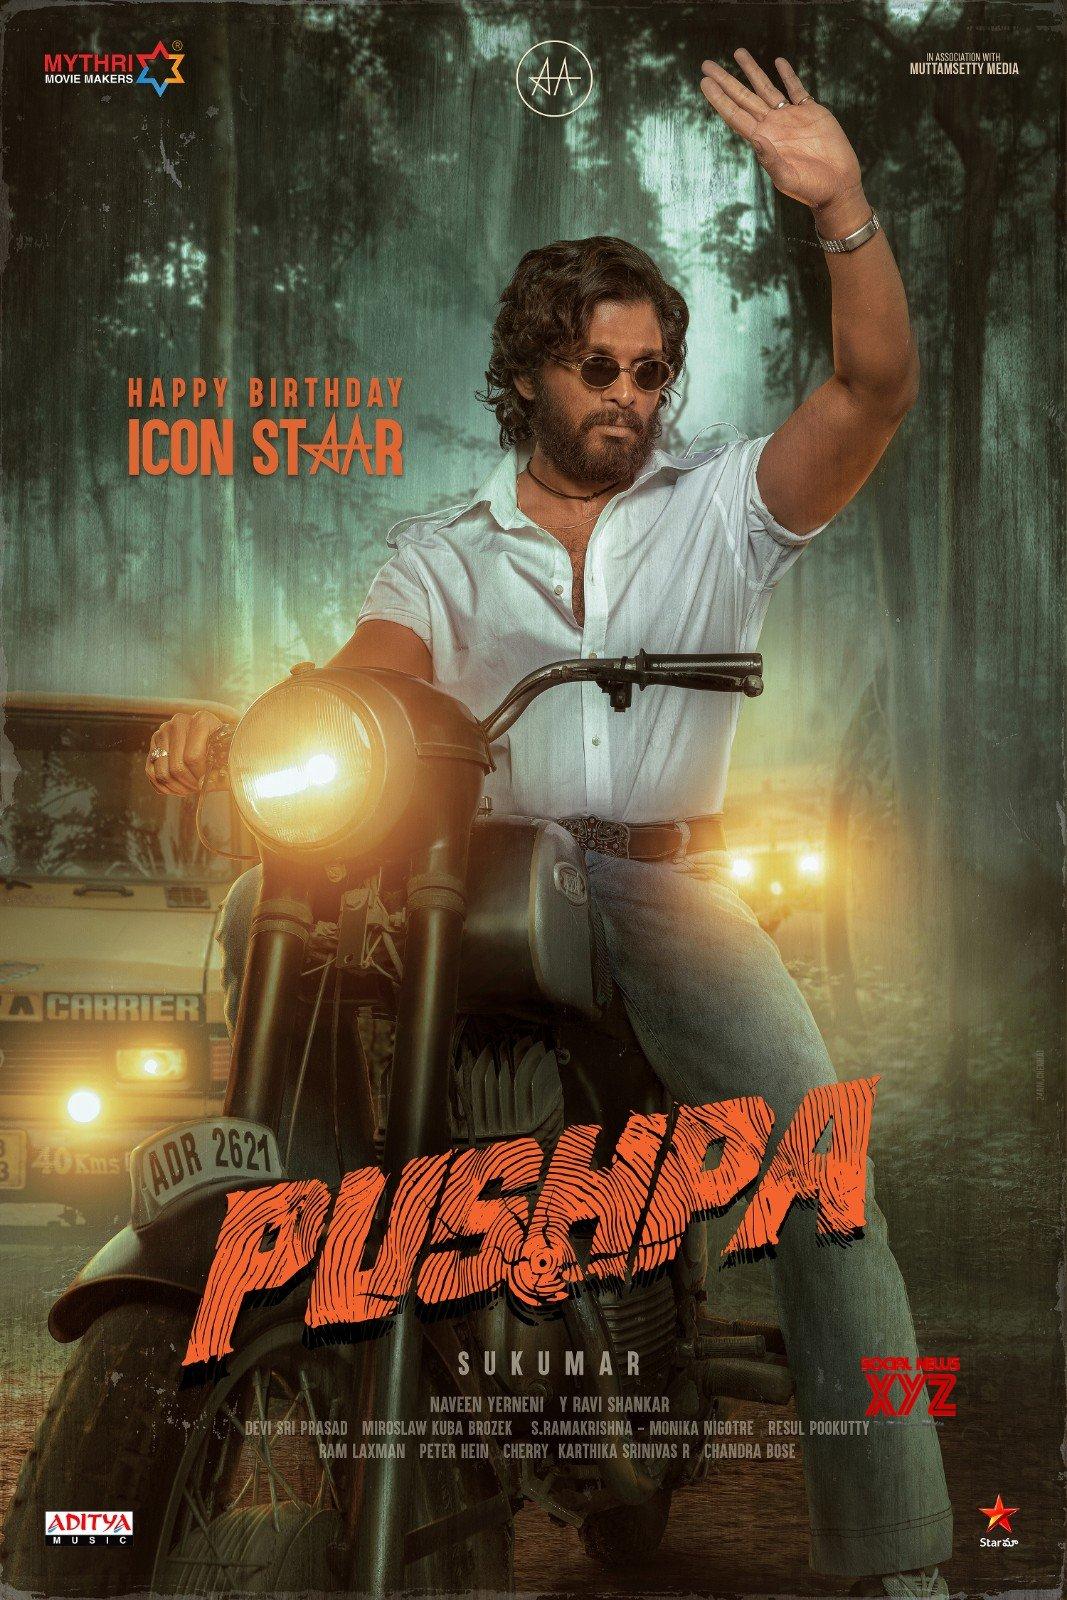 Icon Star Allu Arjun Birthday Poster From Pushpa Movie